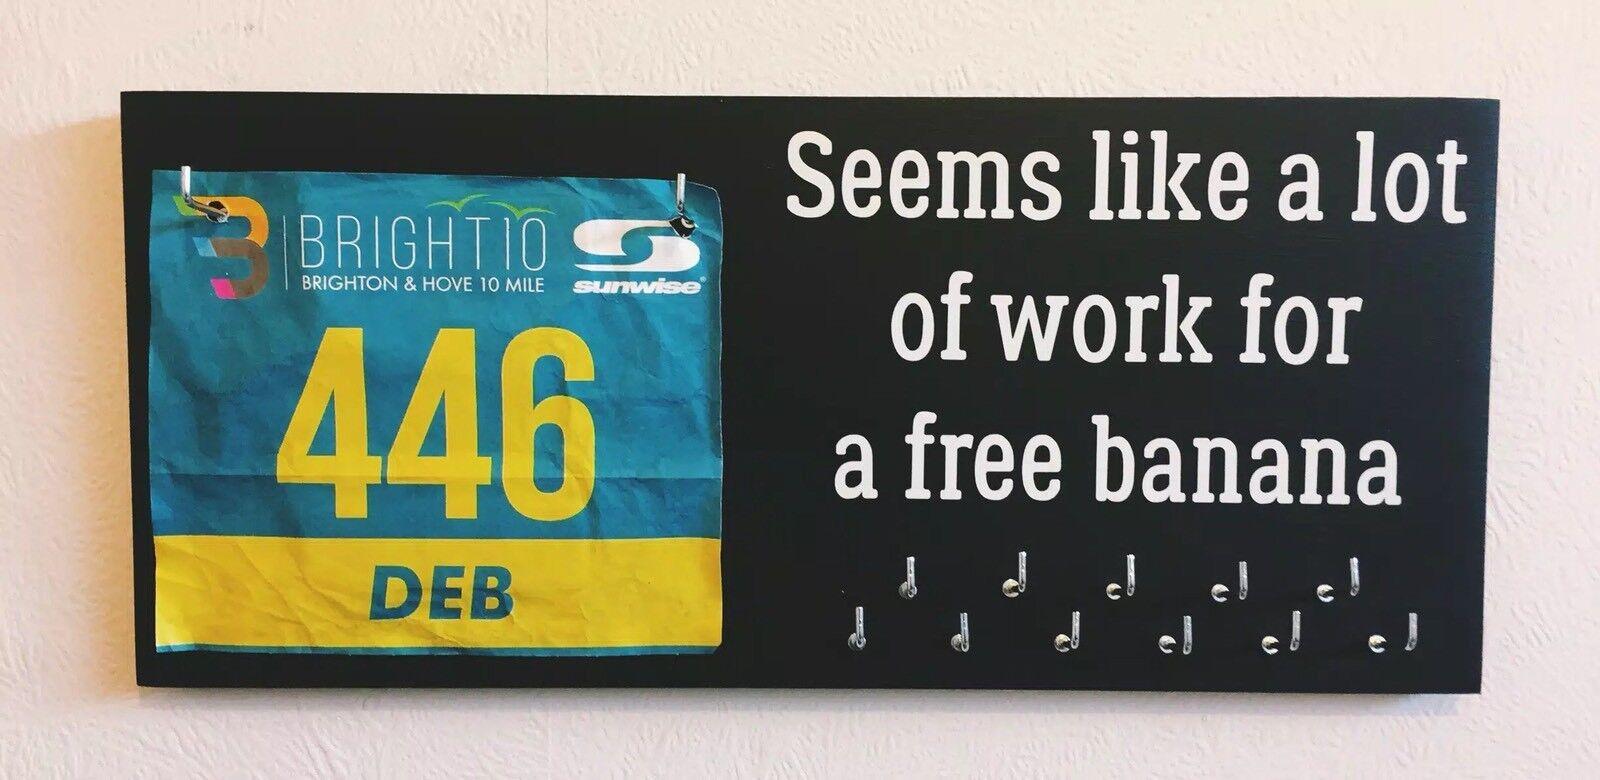 Free Banana Bib & Medal Runner   Sports Medal & Bib hanger   holder  display